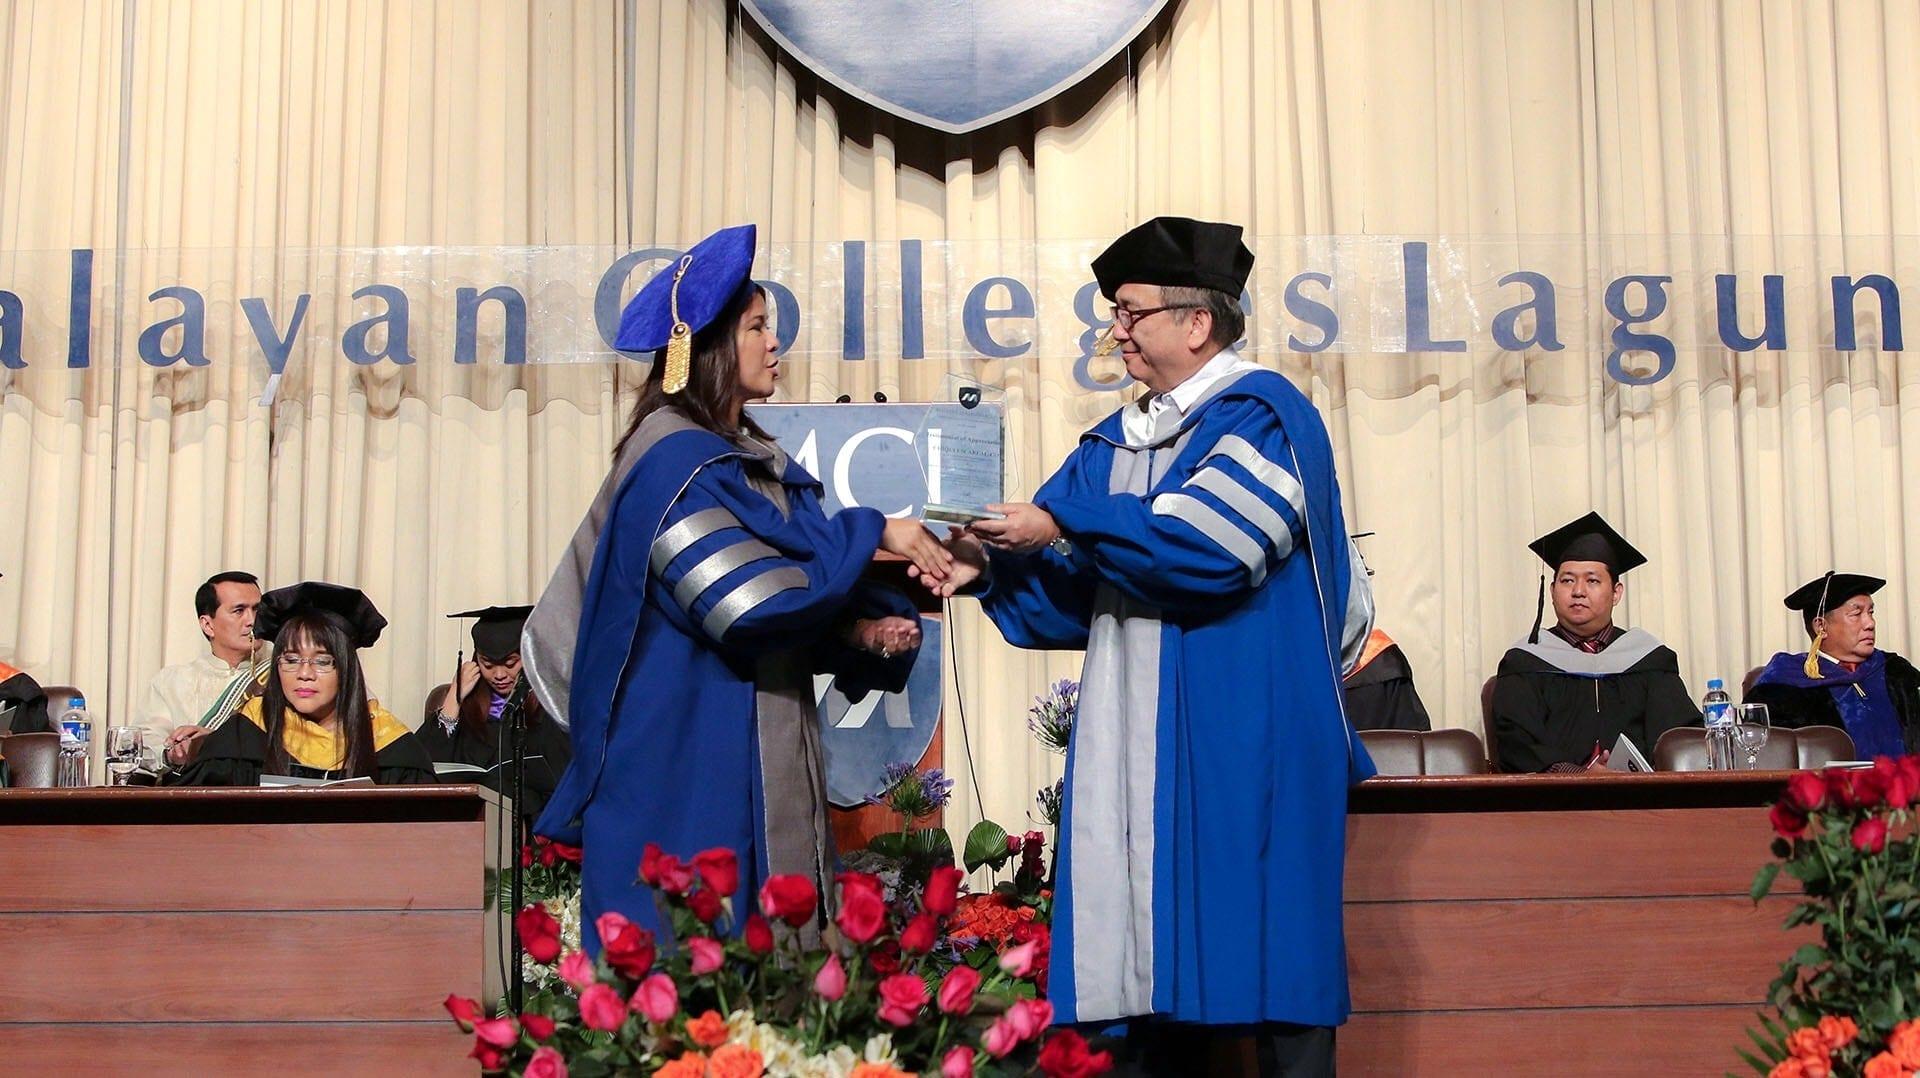 chiqui-escareal-go-graduates